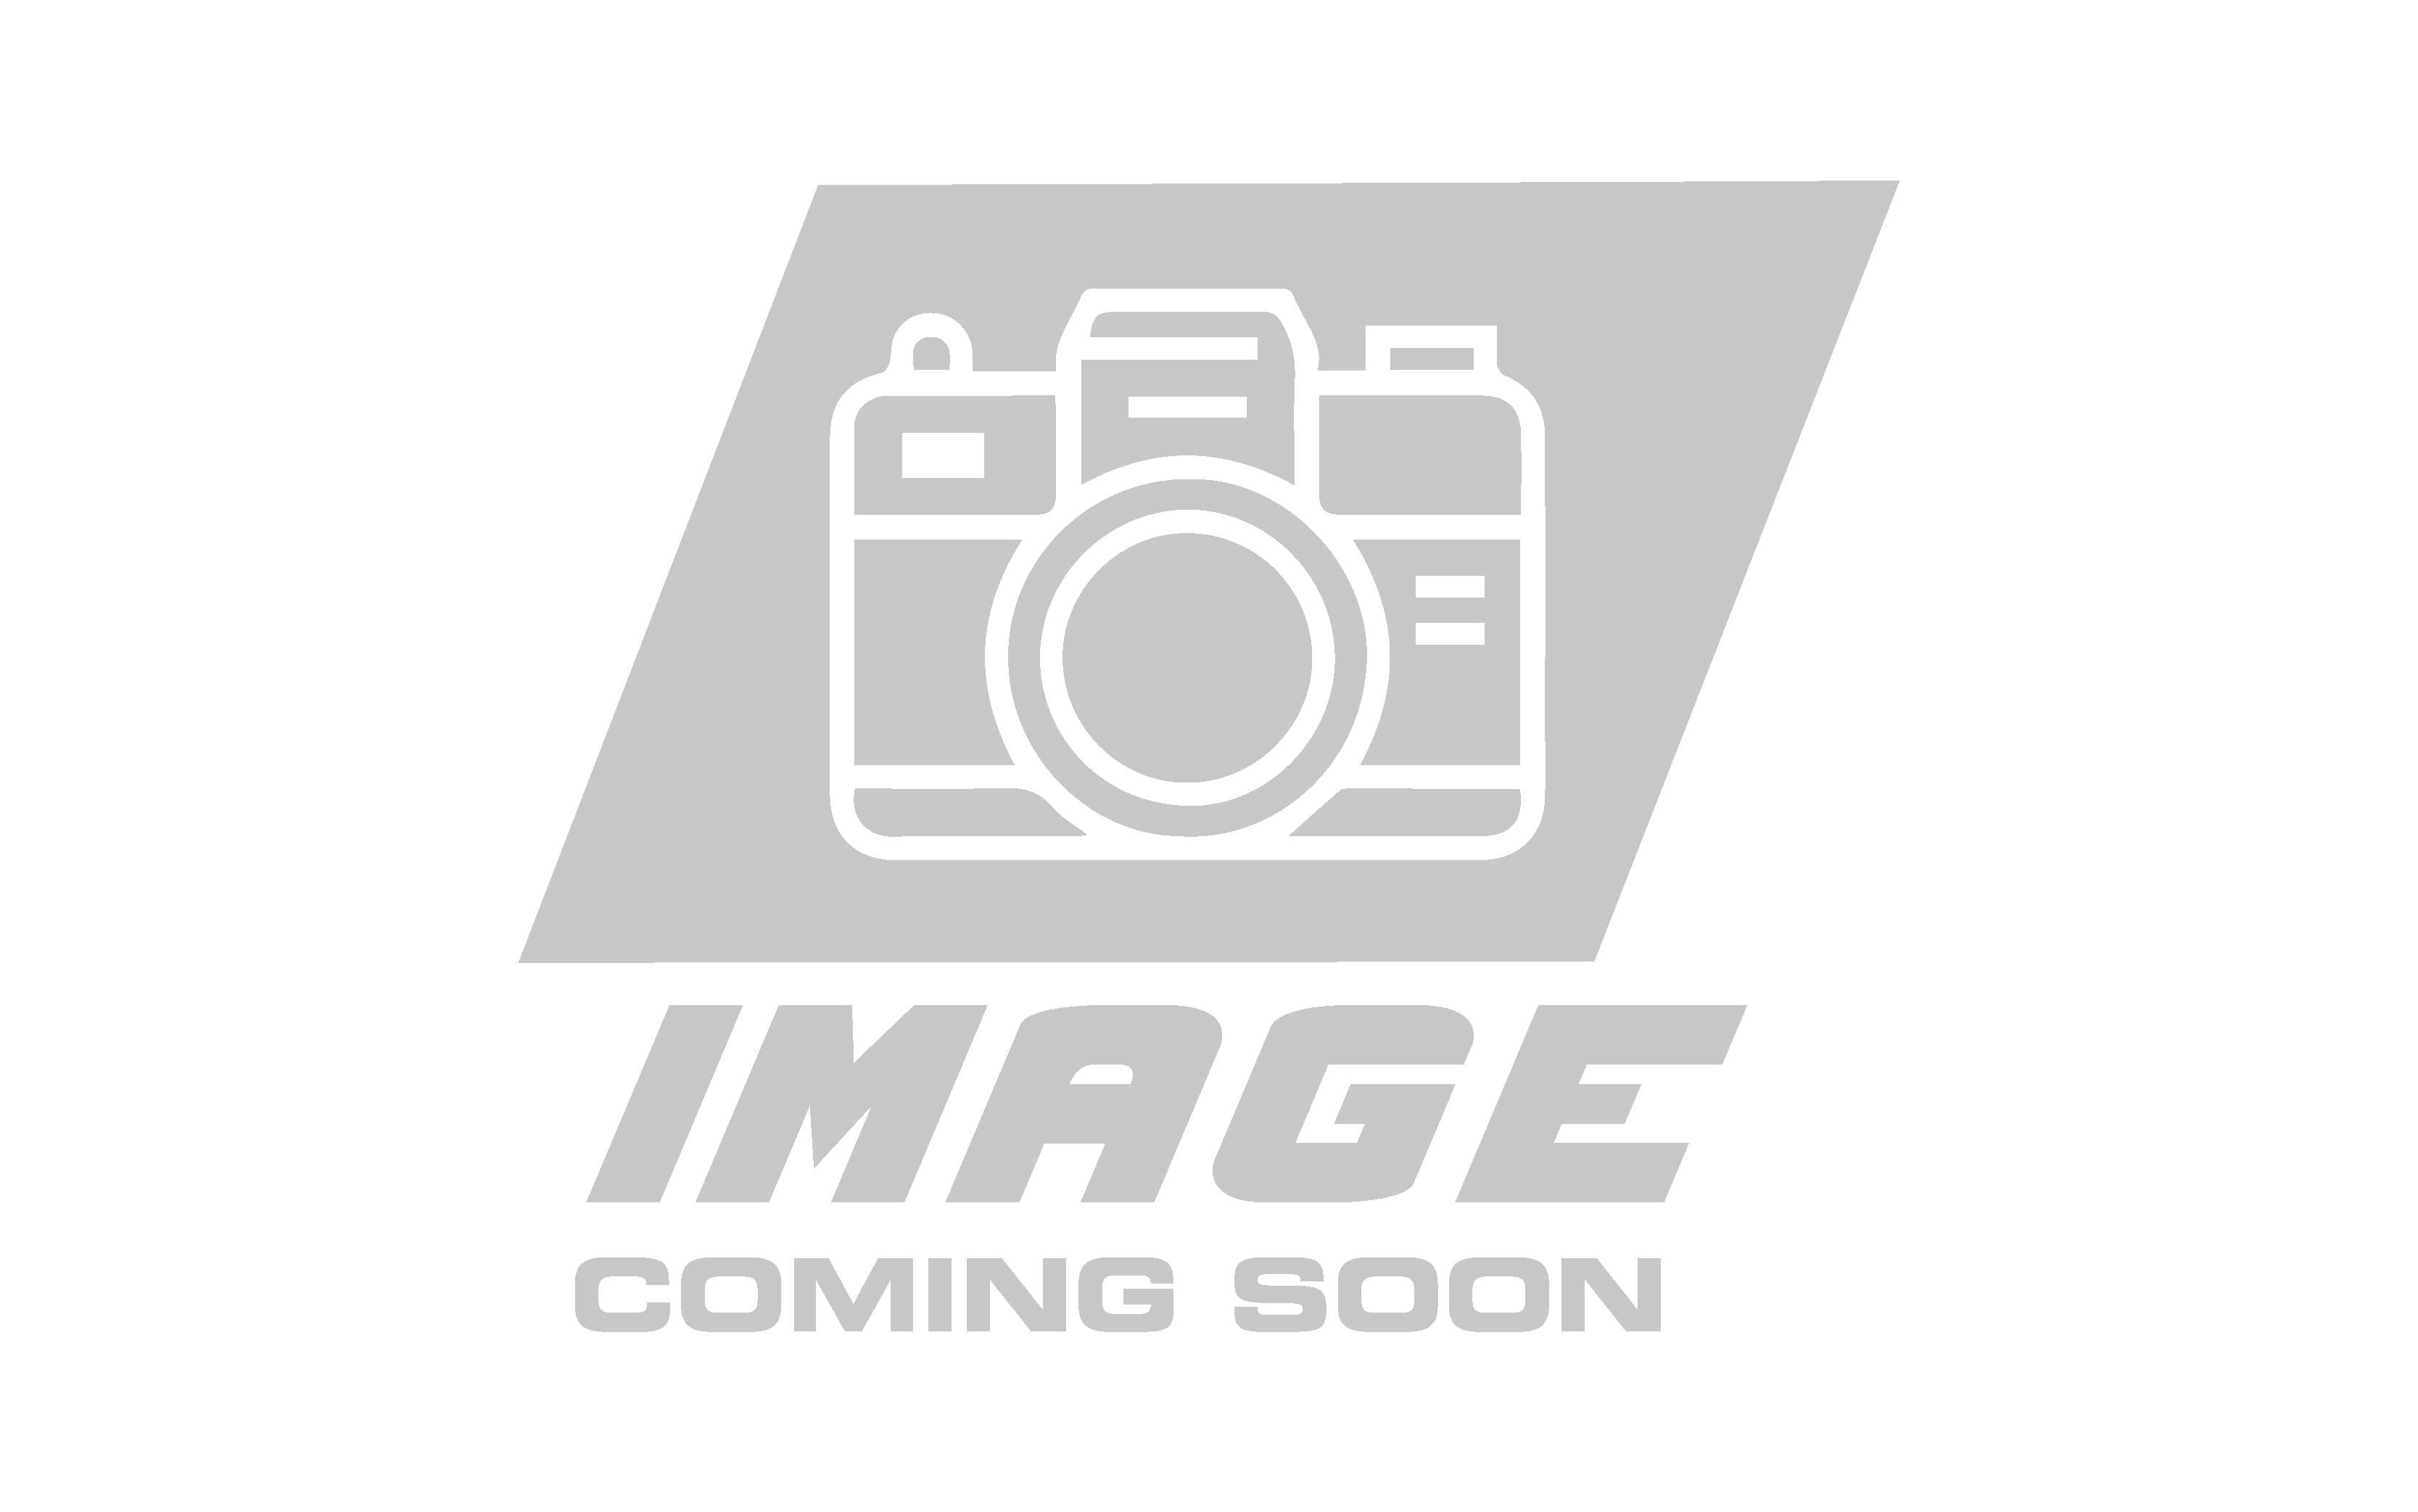 subaru_impreza_wrx_sti_gd_air_lift_front_camber_plate_set